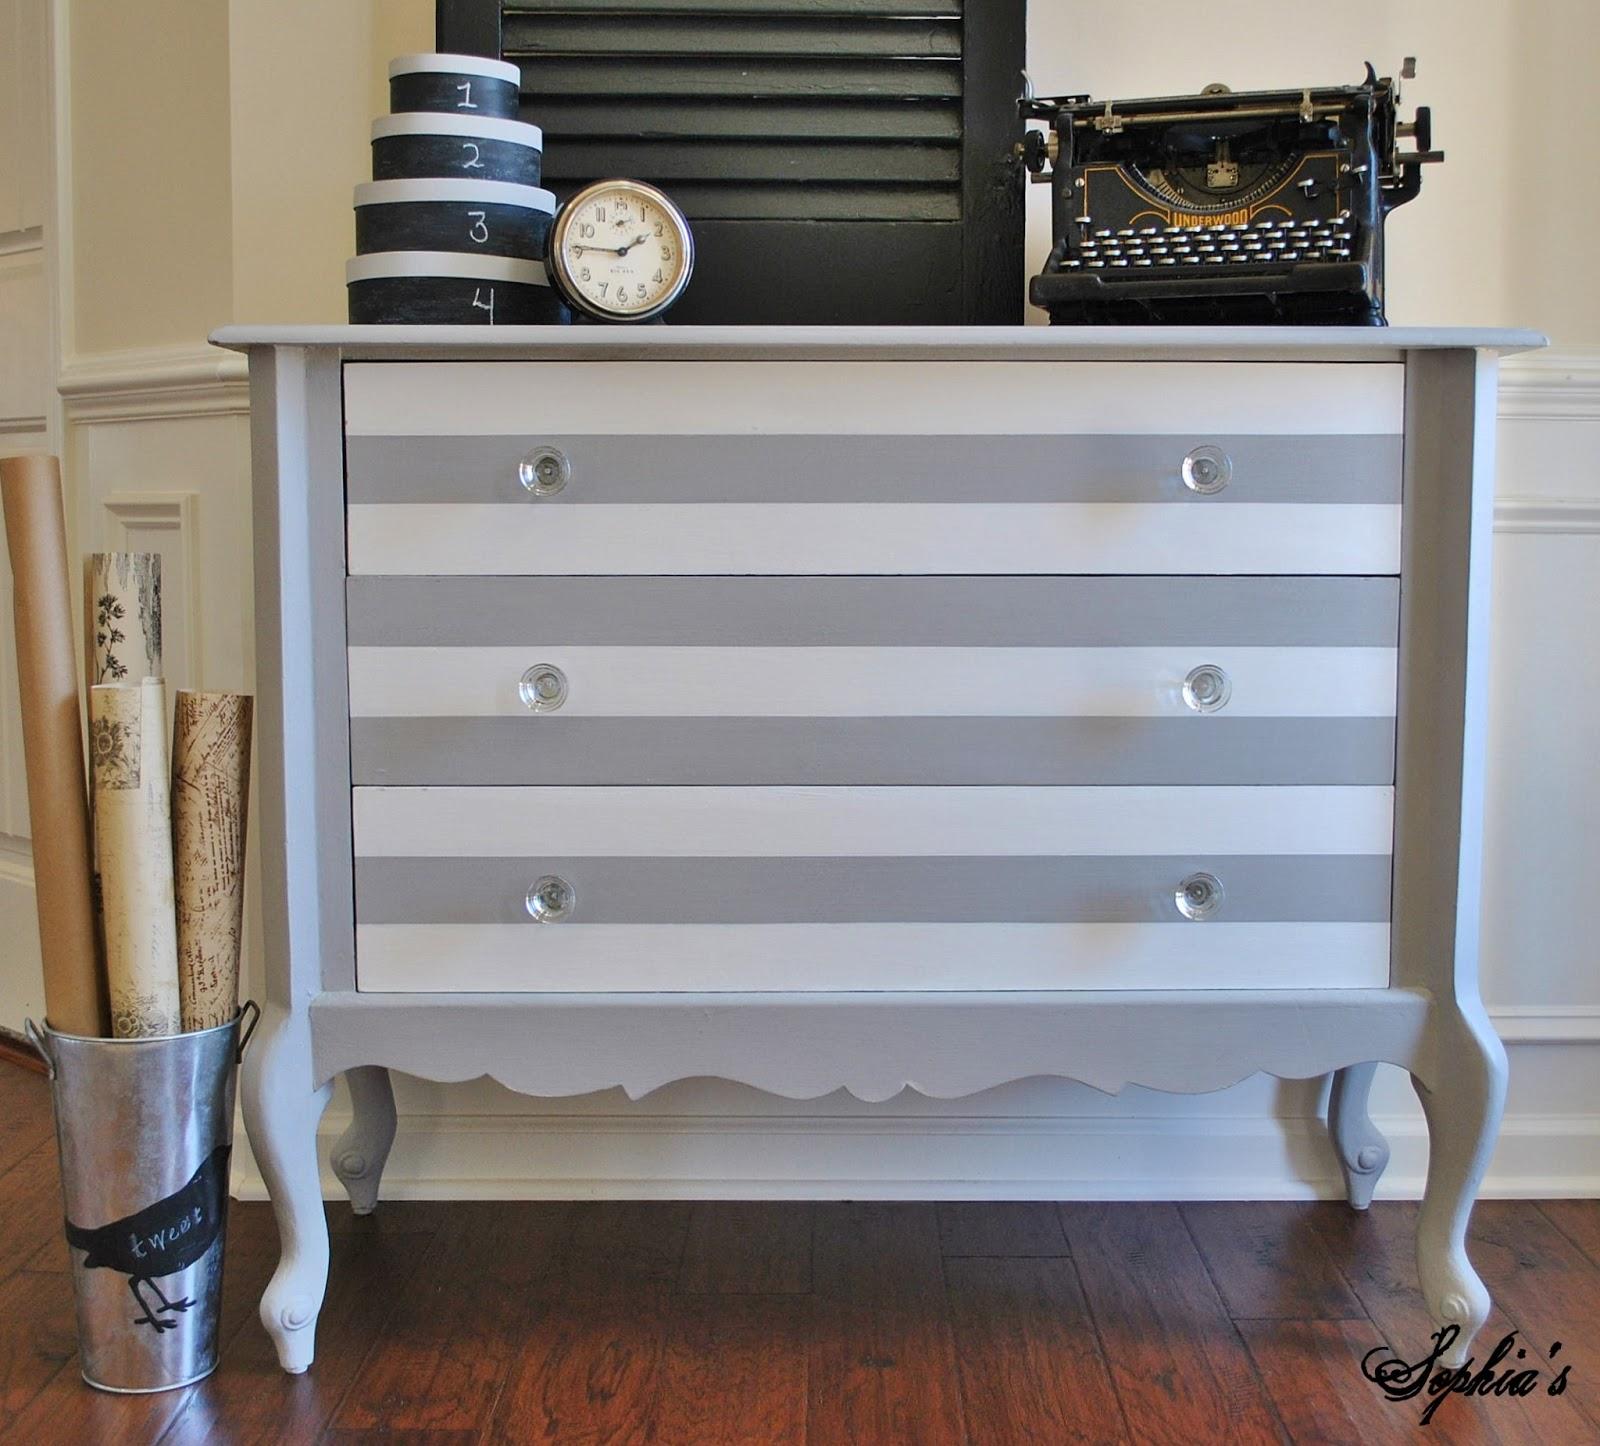 Famous Sophia's: Paris Grey & White Striped Dresser RO84